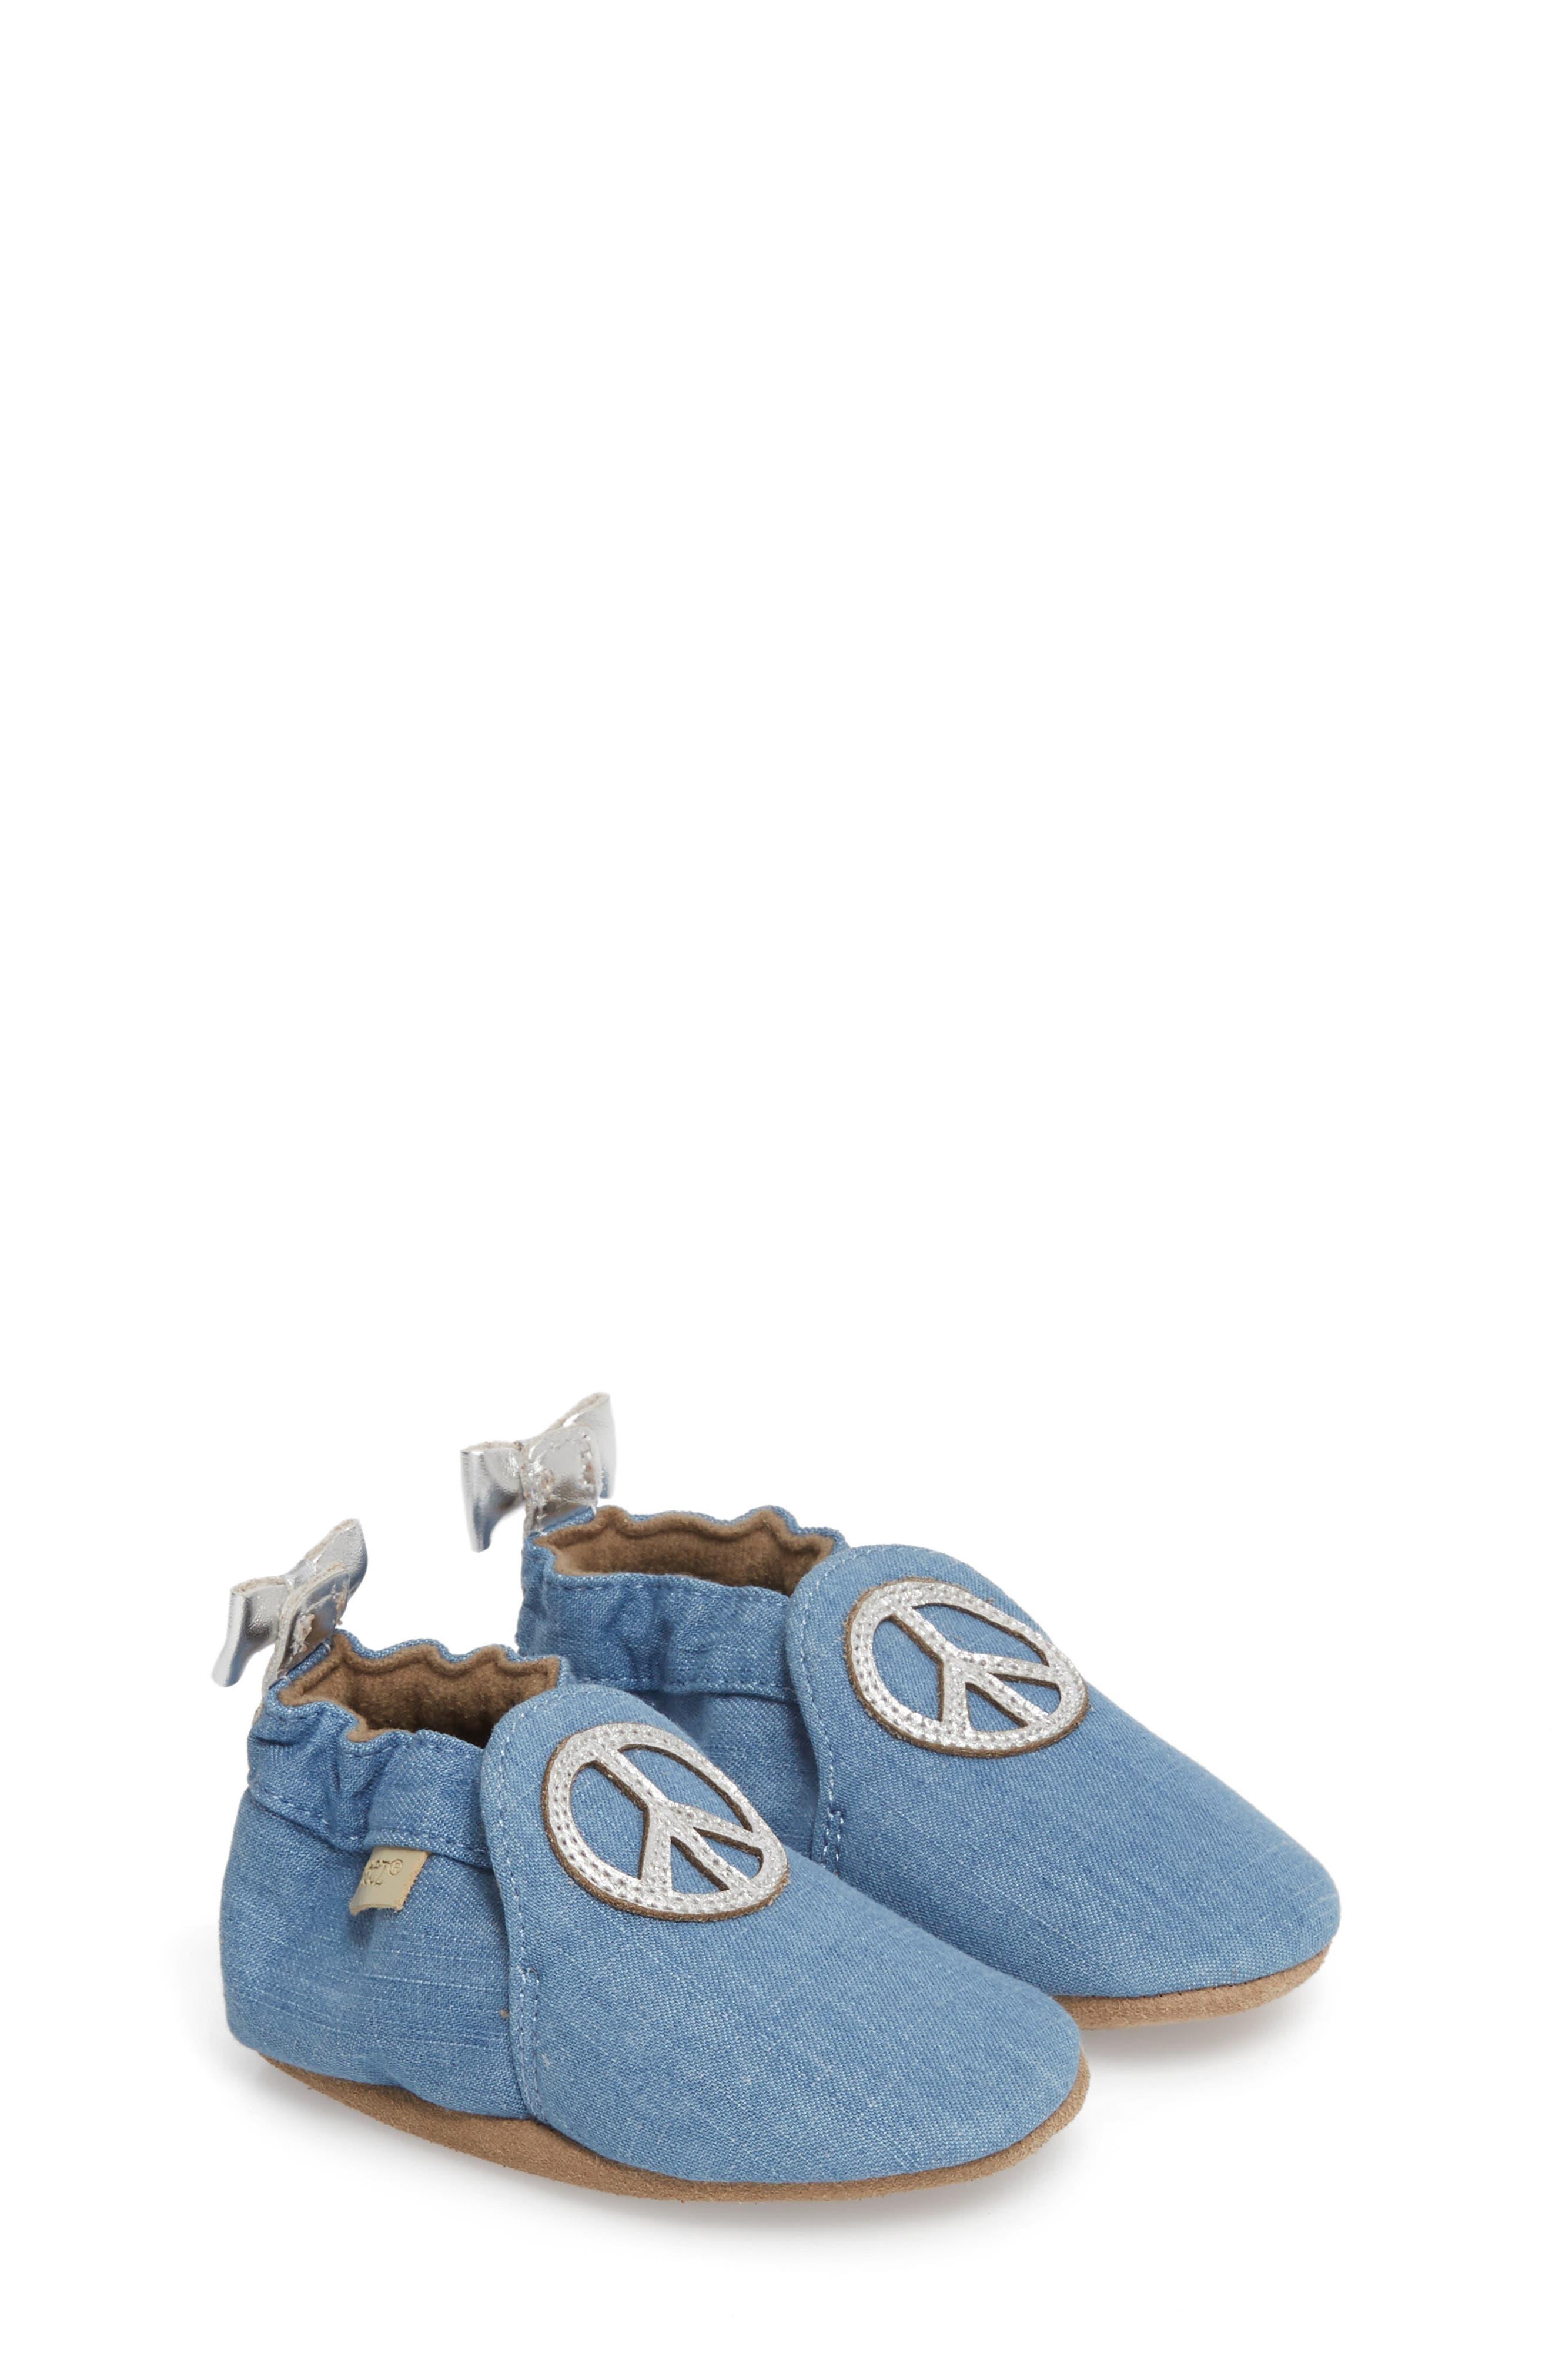 Peace Out Moccasin Crib Shoe,                             Alternate thumbnail 3, color,                             Blue